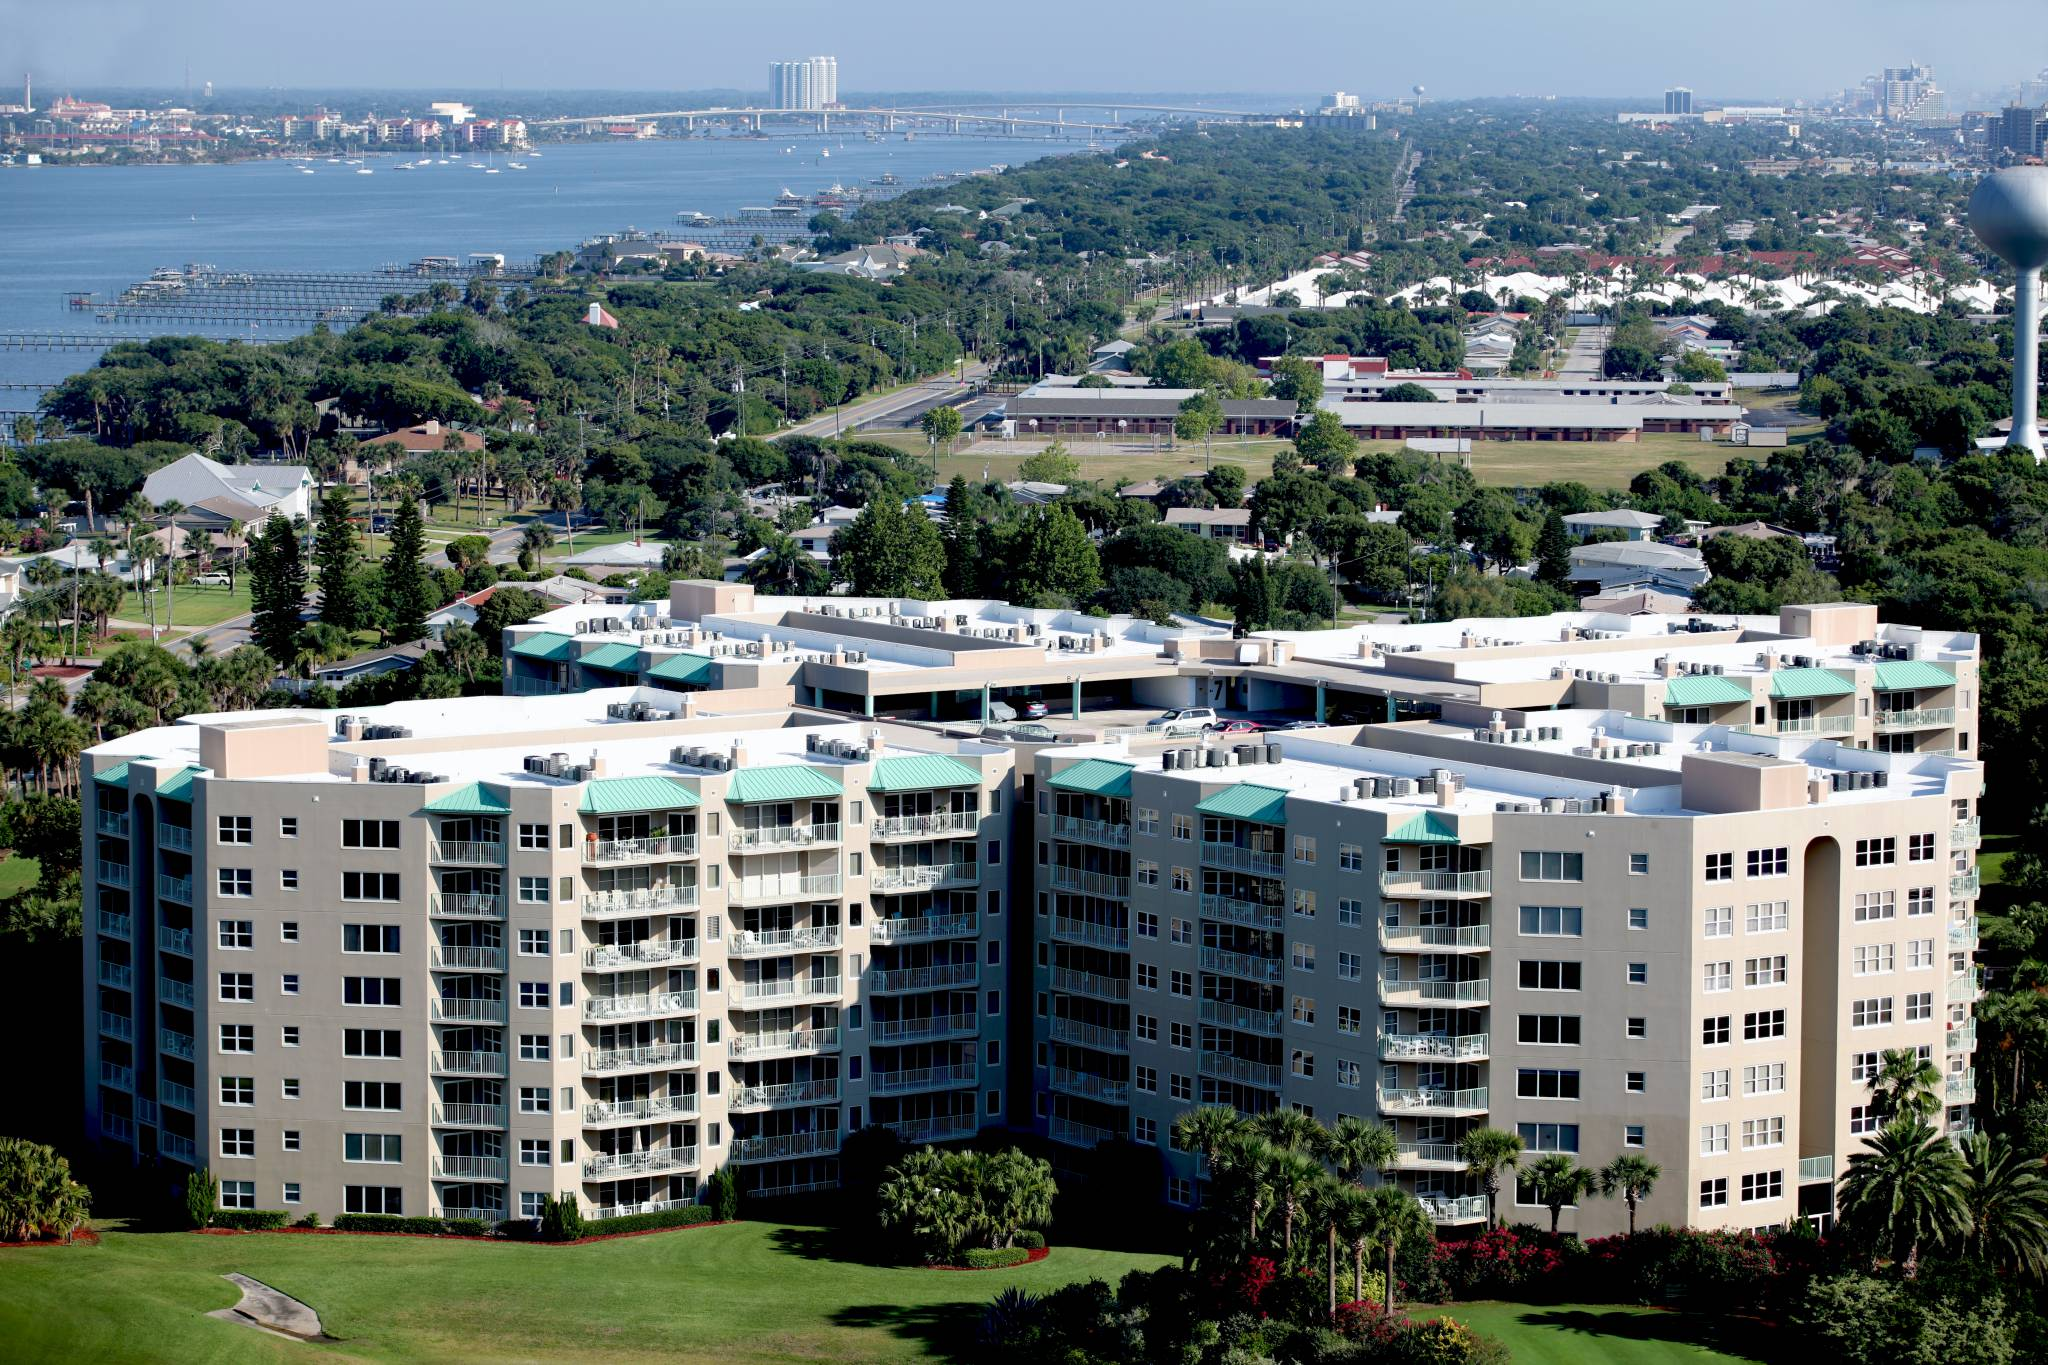 Cloverleaf Condo Daytona Beach Shores